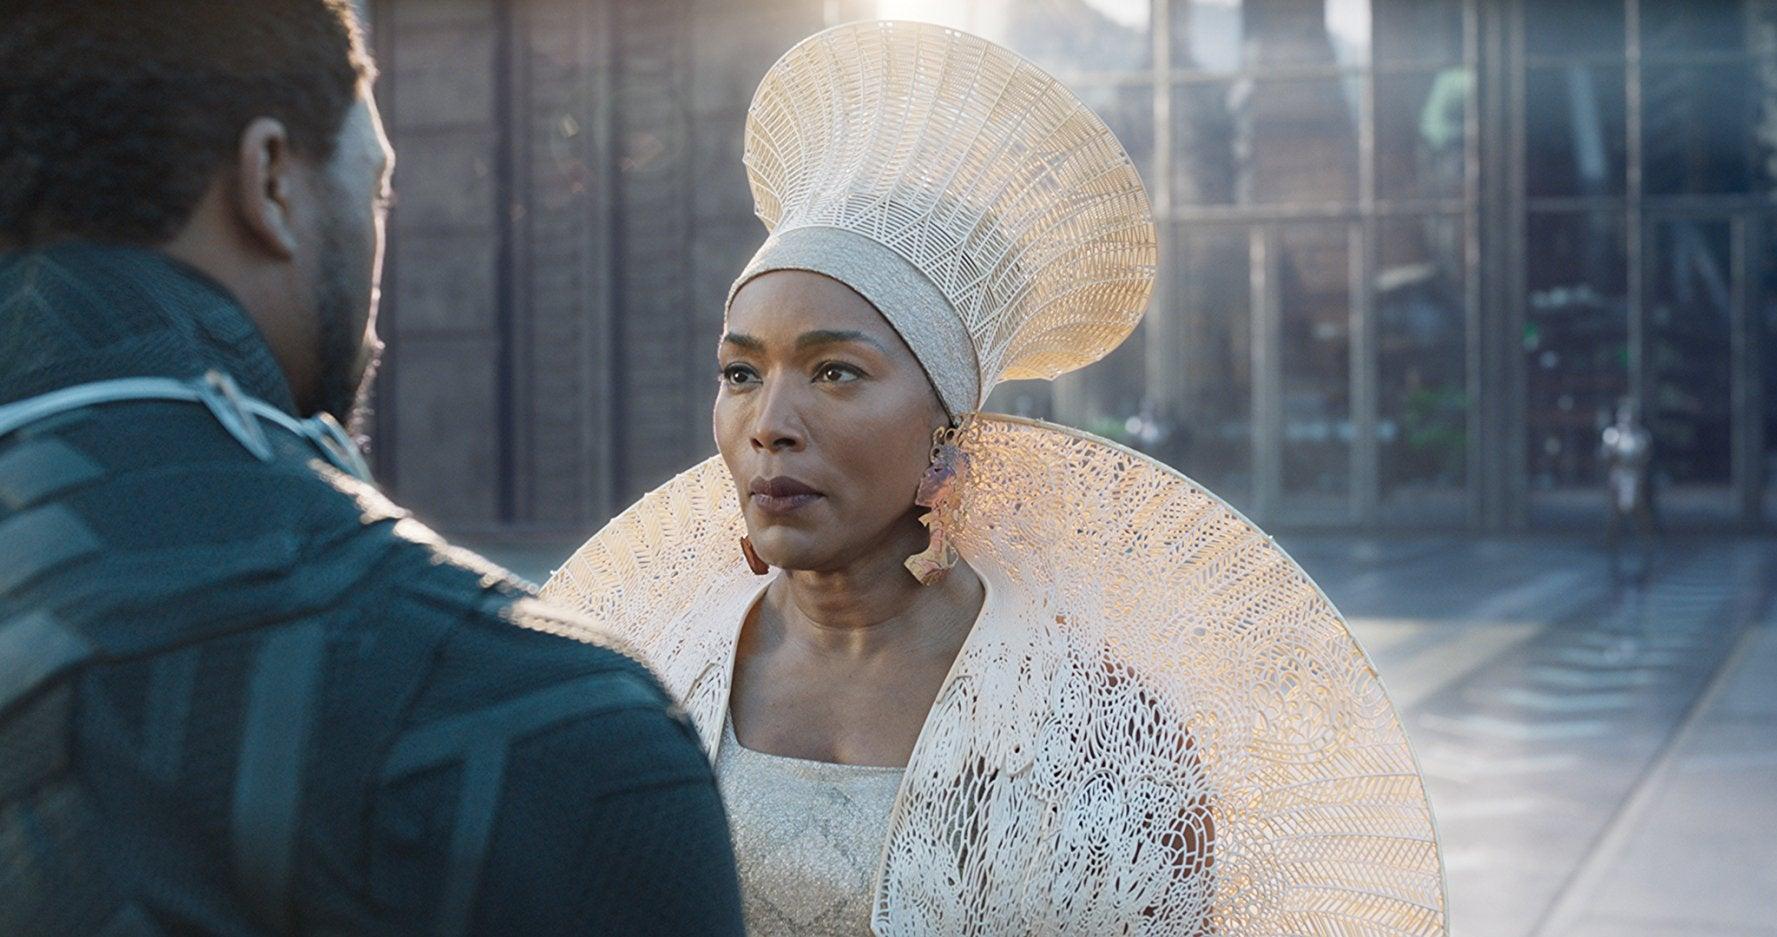 Angela Bassett as Queen Ramonda wears an elaborate white costume with a tall hat.